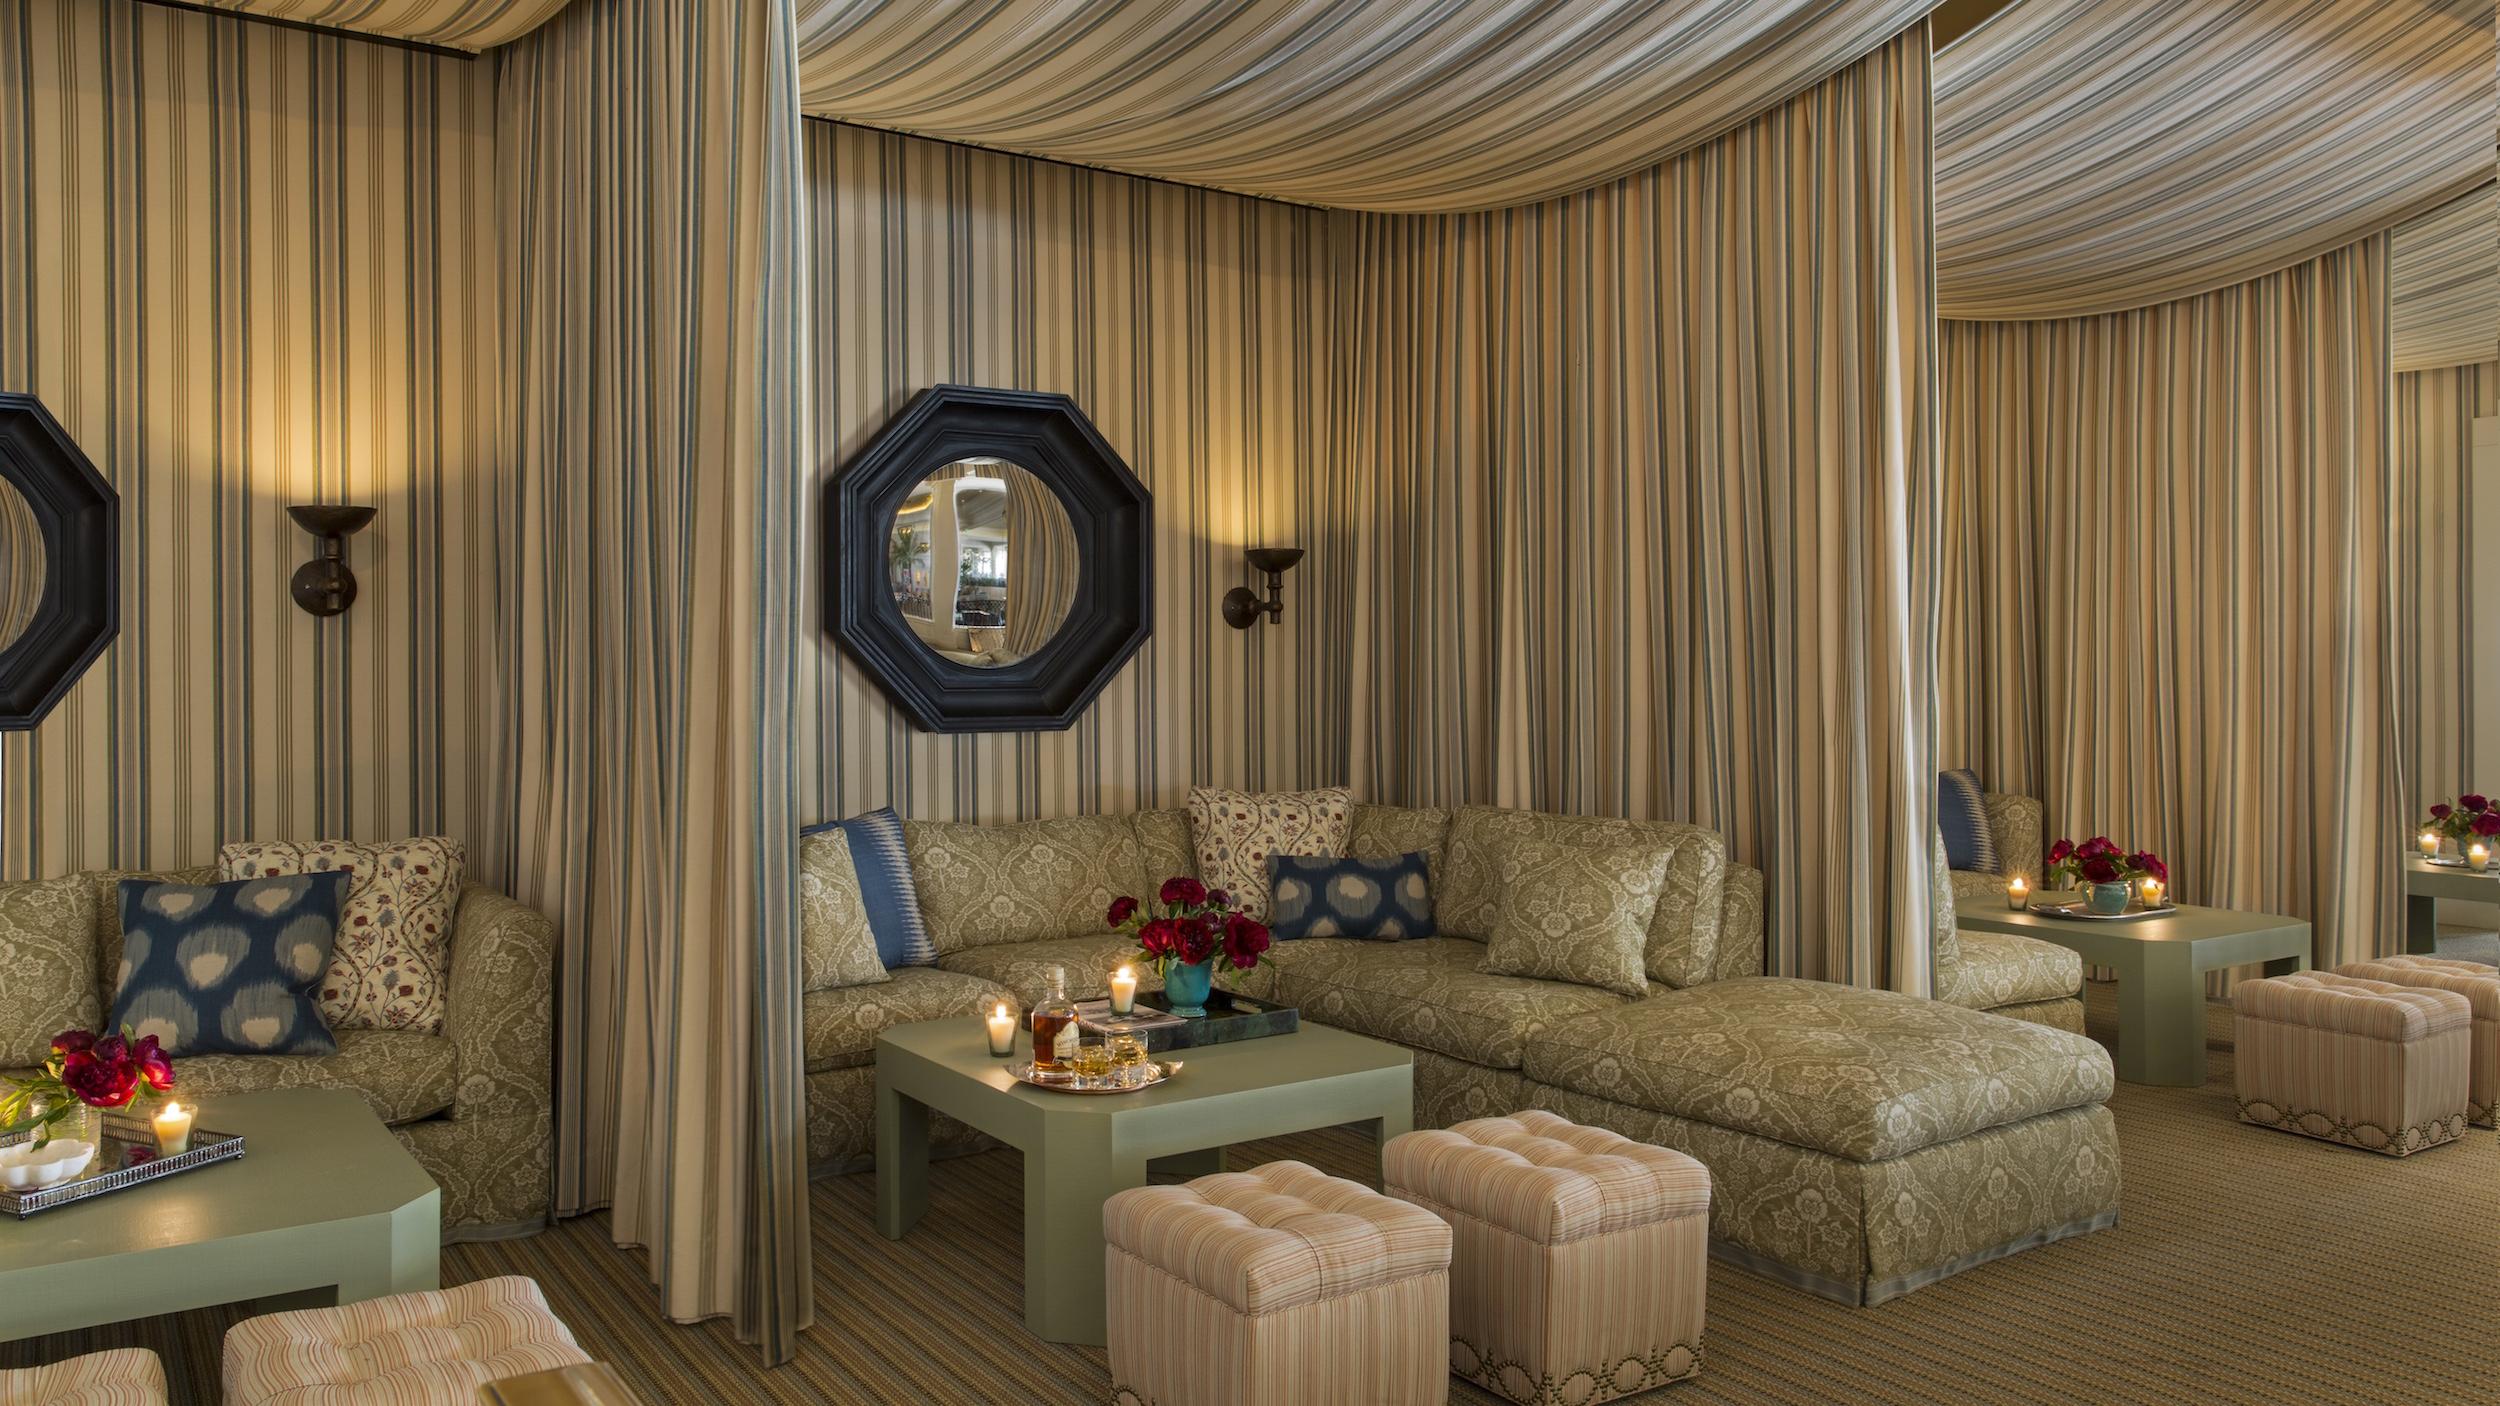 Press News From Santa Monica Beach Hotel Hotel Casa Del Mar